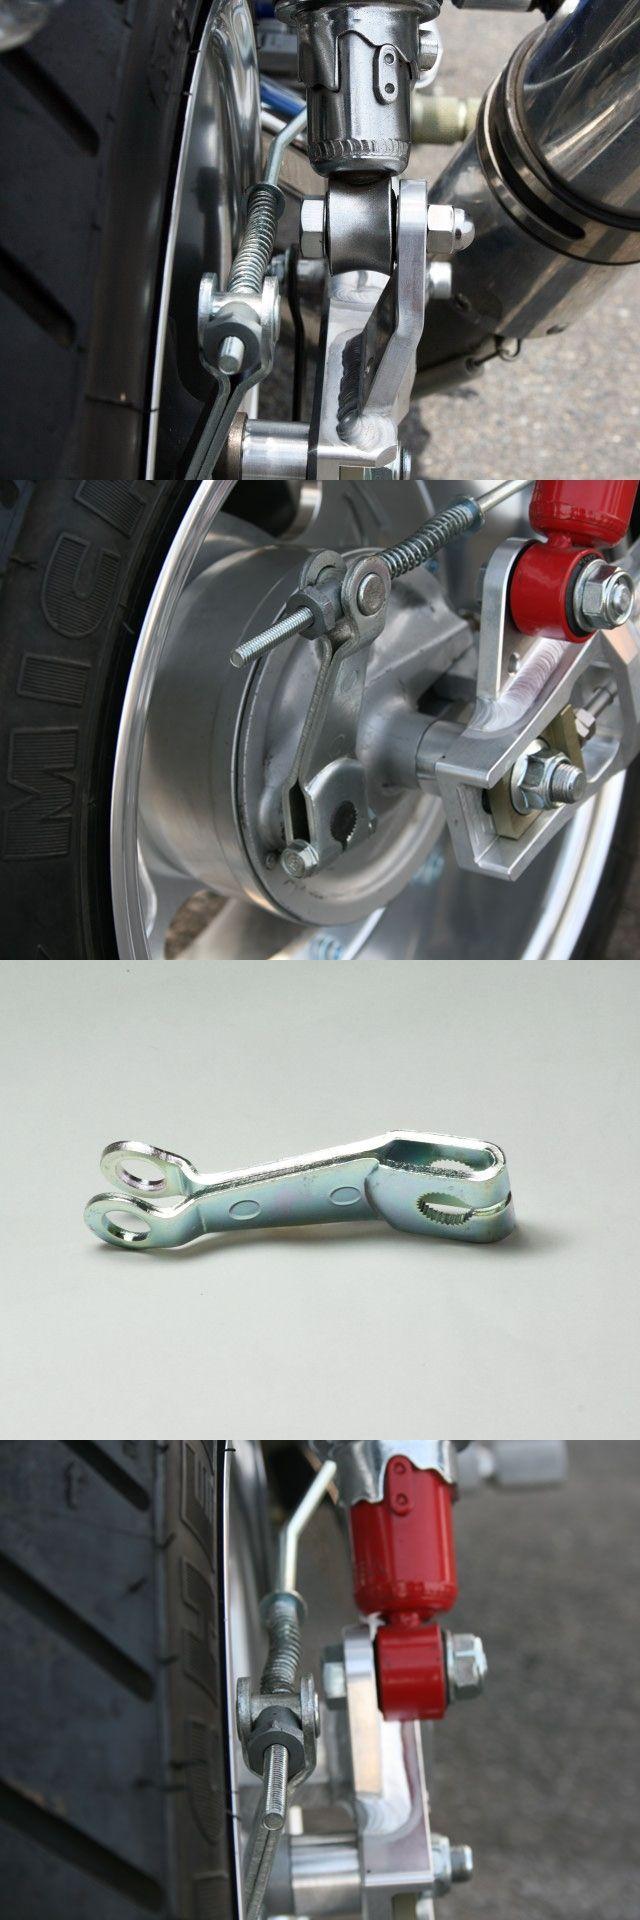 【G-Craft】鼓式煞車臂 - 「Webike-摩托百貨」